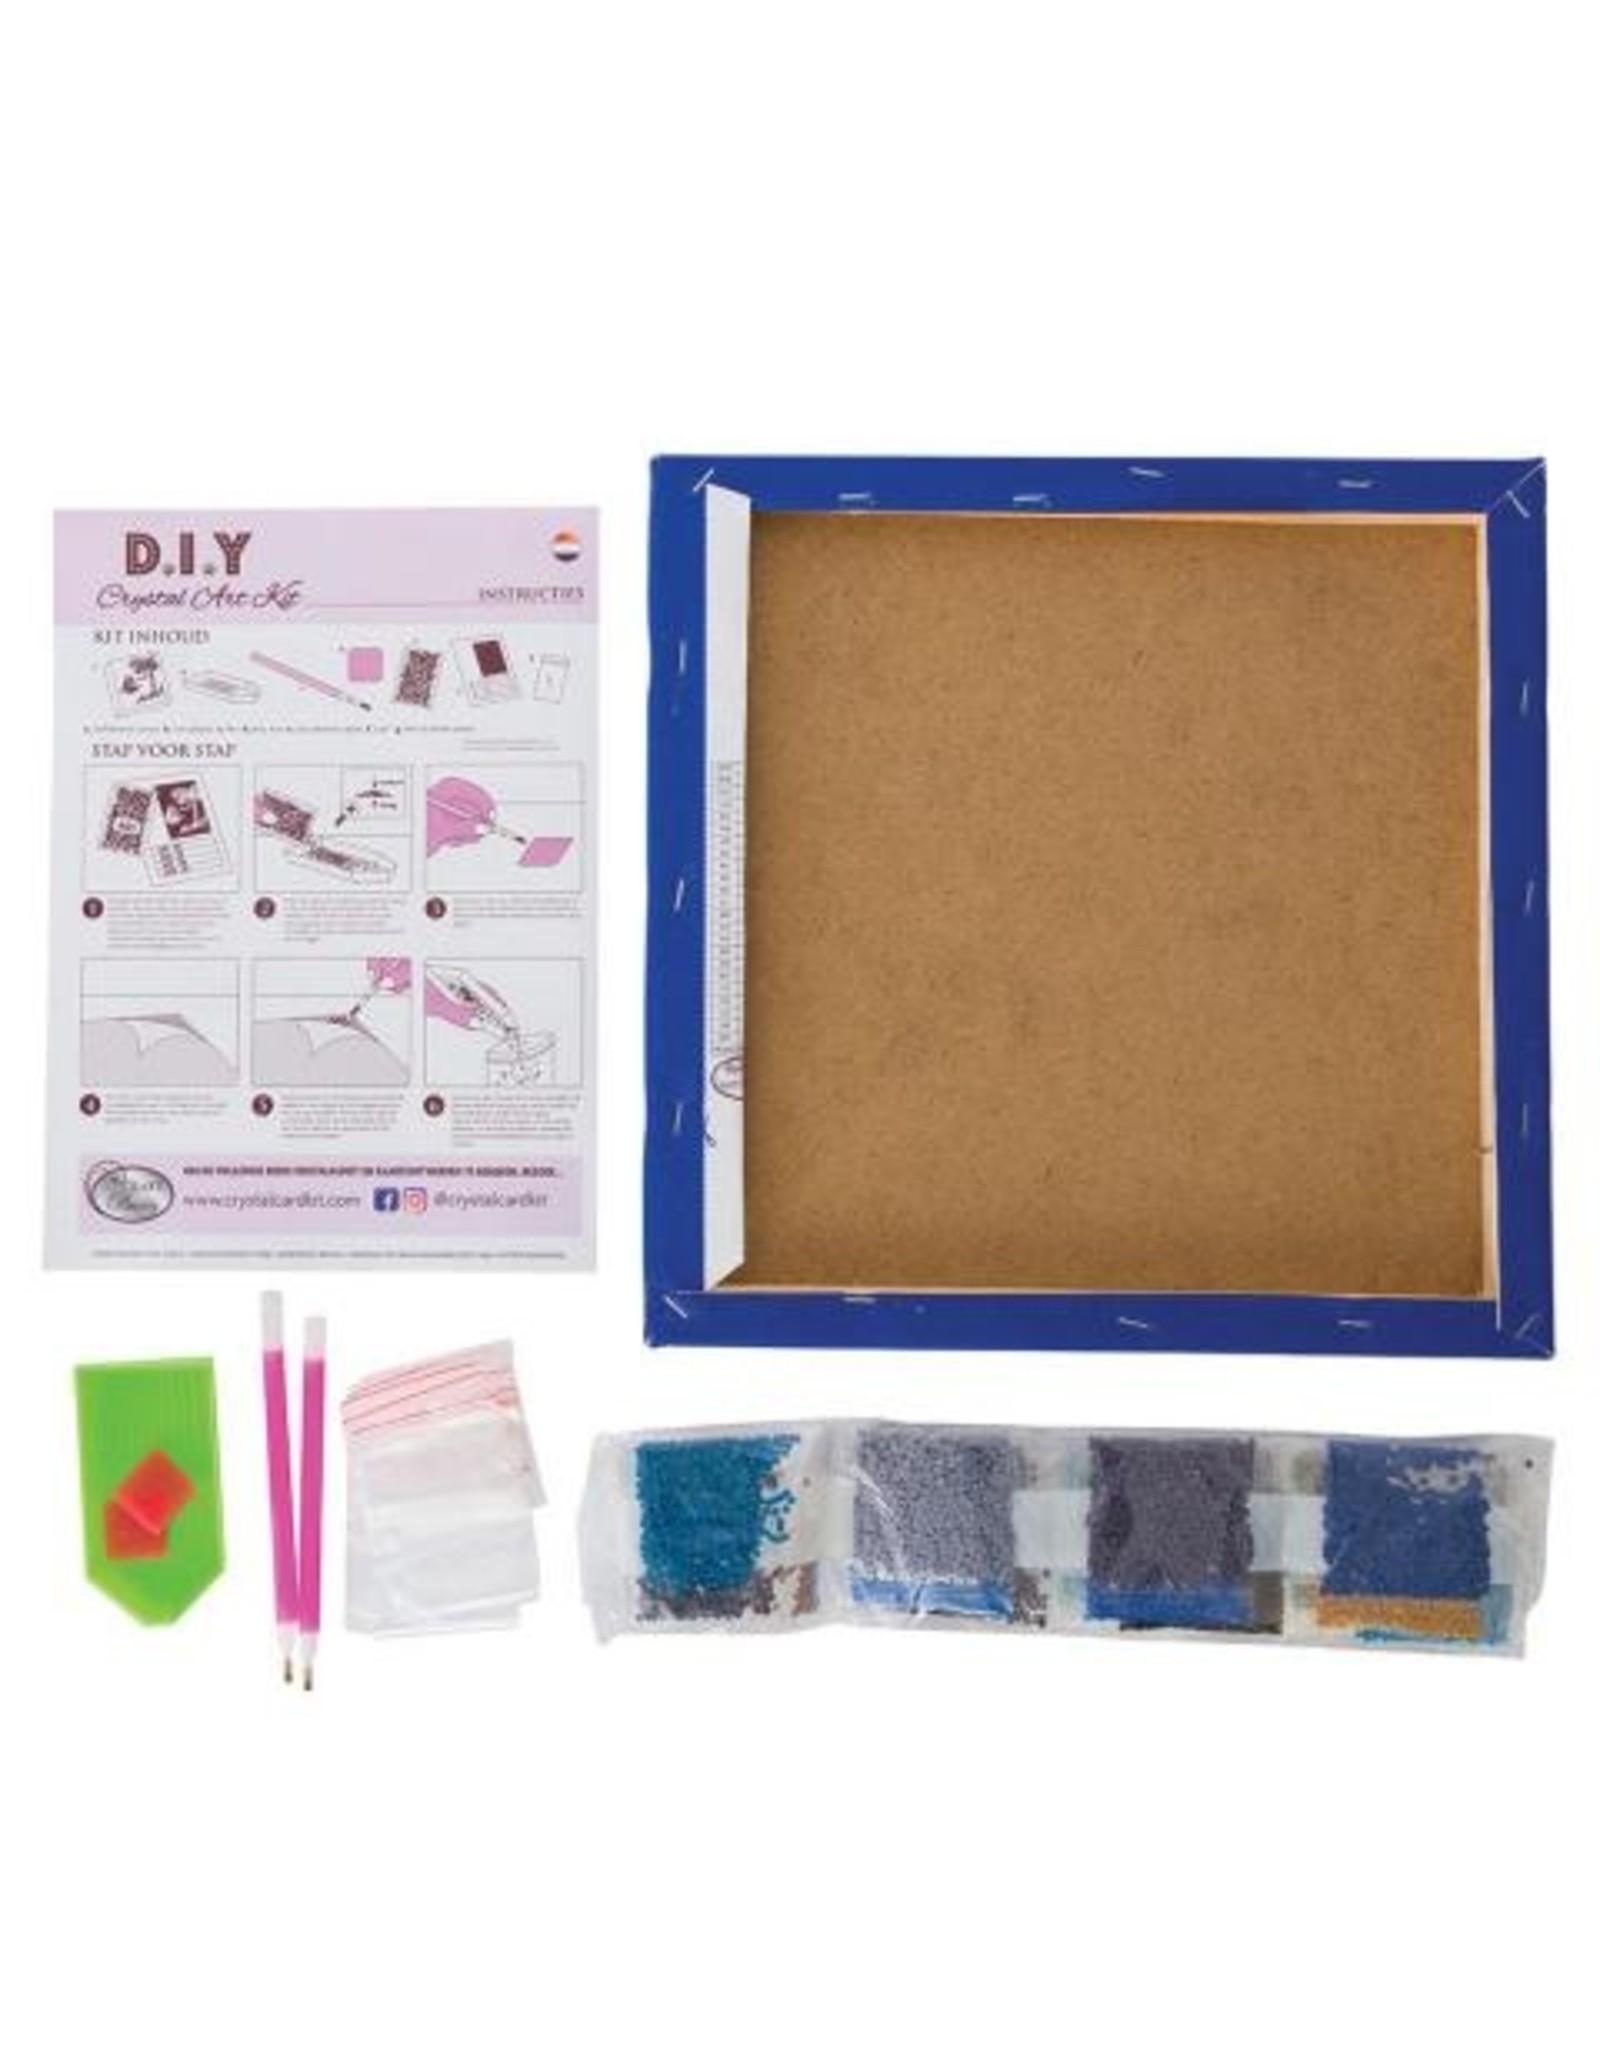 D.I.Y Crystal Art Kit Crystal Art Medium Framed Kit - Elephant of the Savannah